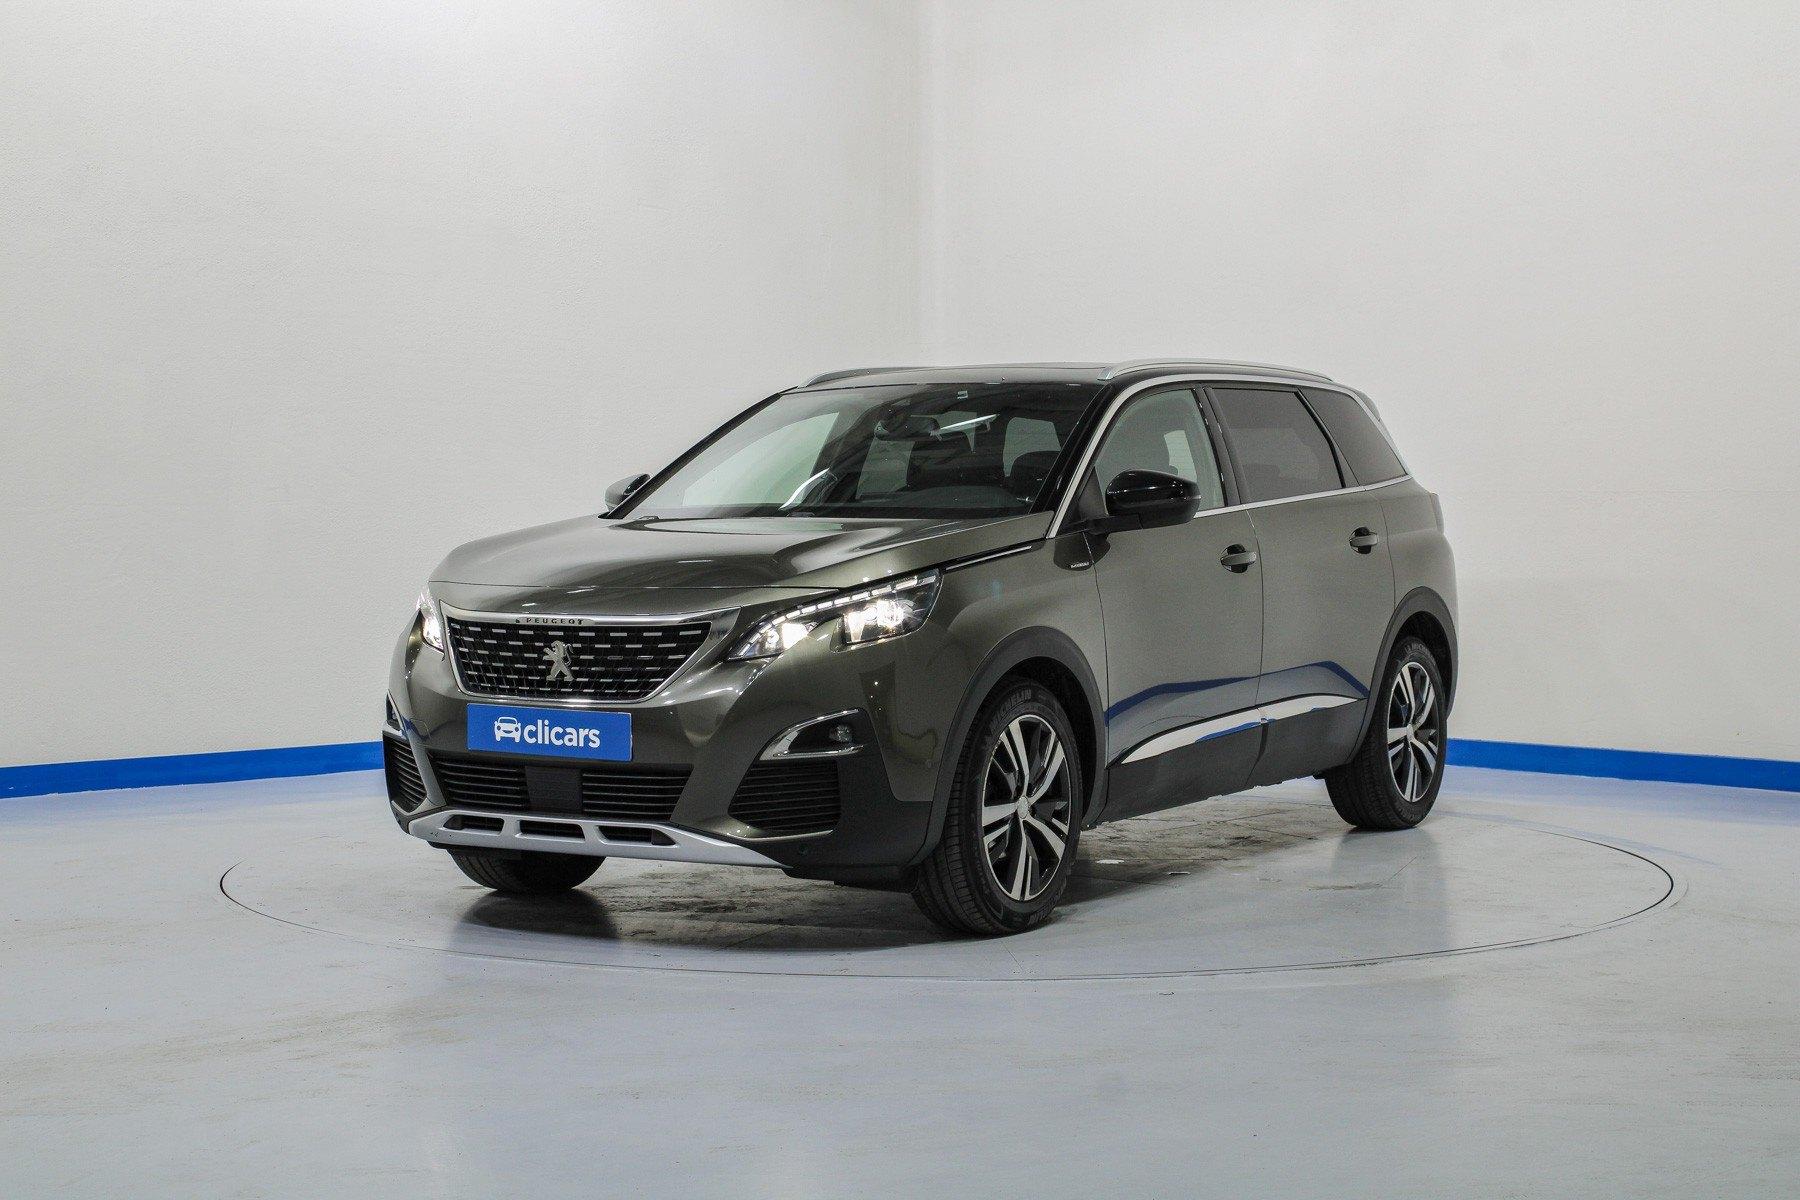 Hyundai Tucson vs Peugeot 5008: comparativa detallada de los SUV 4X4